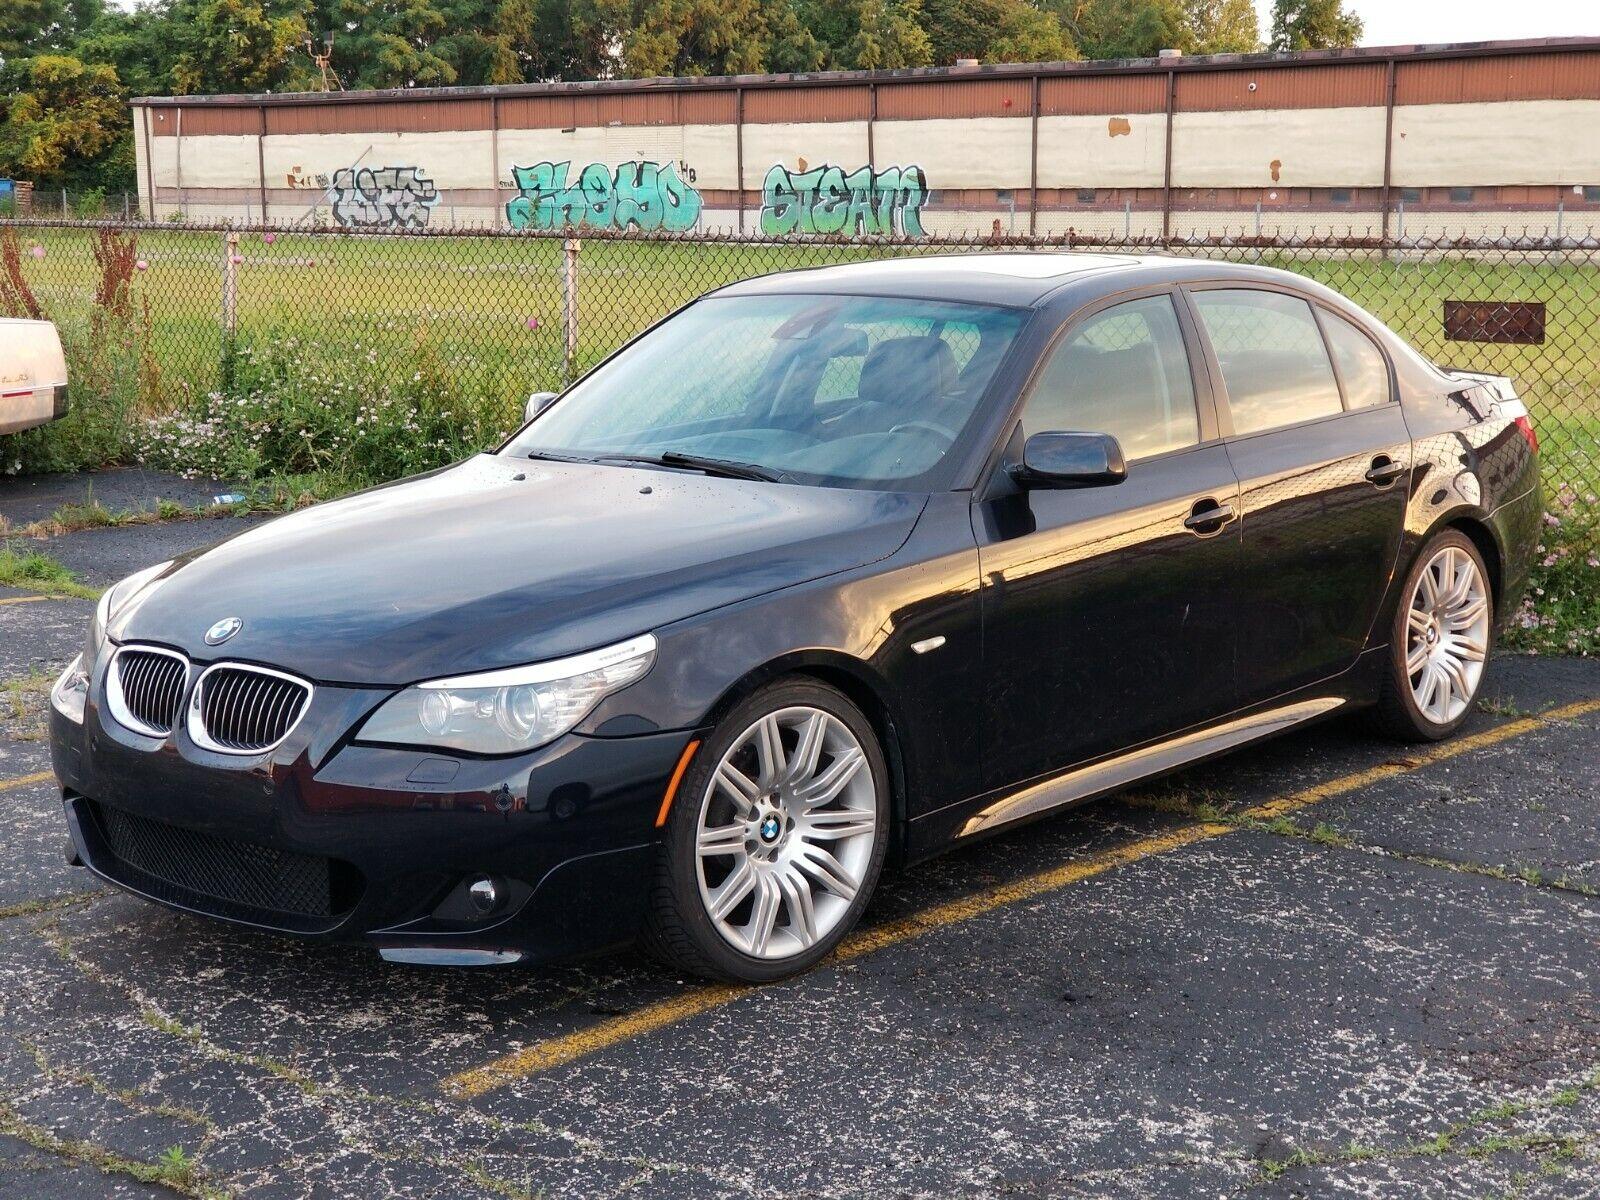 2008 BMW 5-Series 550i 2008 BMW 5-Series E60 550i V8 4.8L Auto Sport - M Wheels, Lane Departure, Nav,